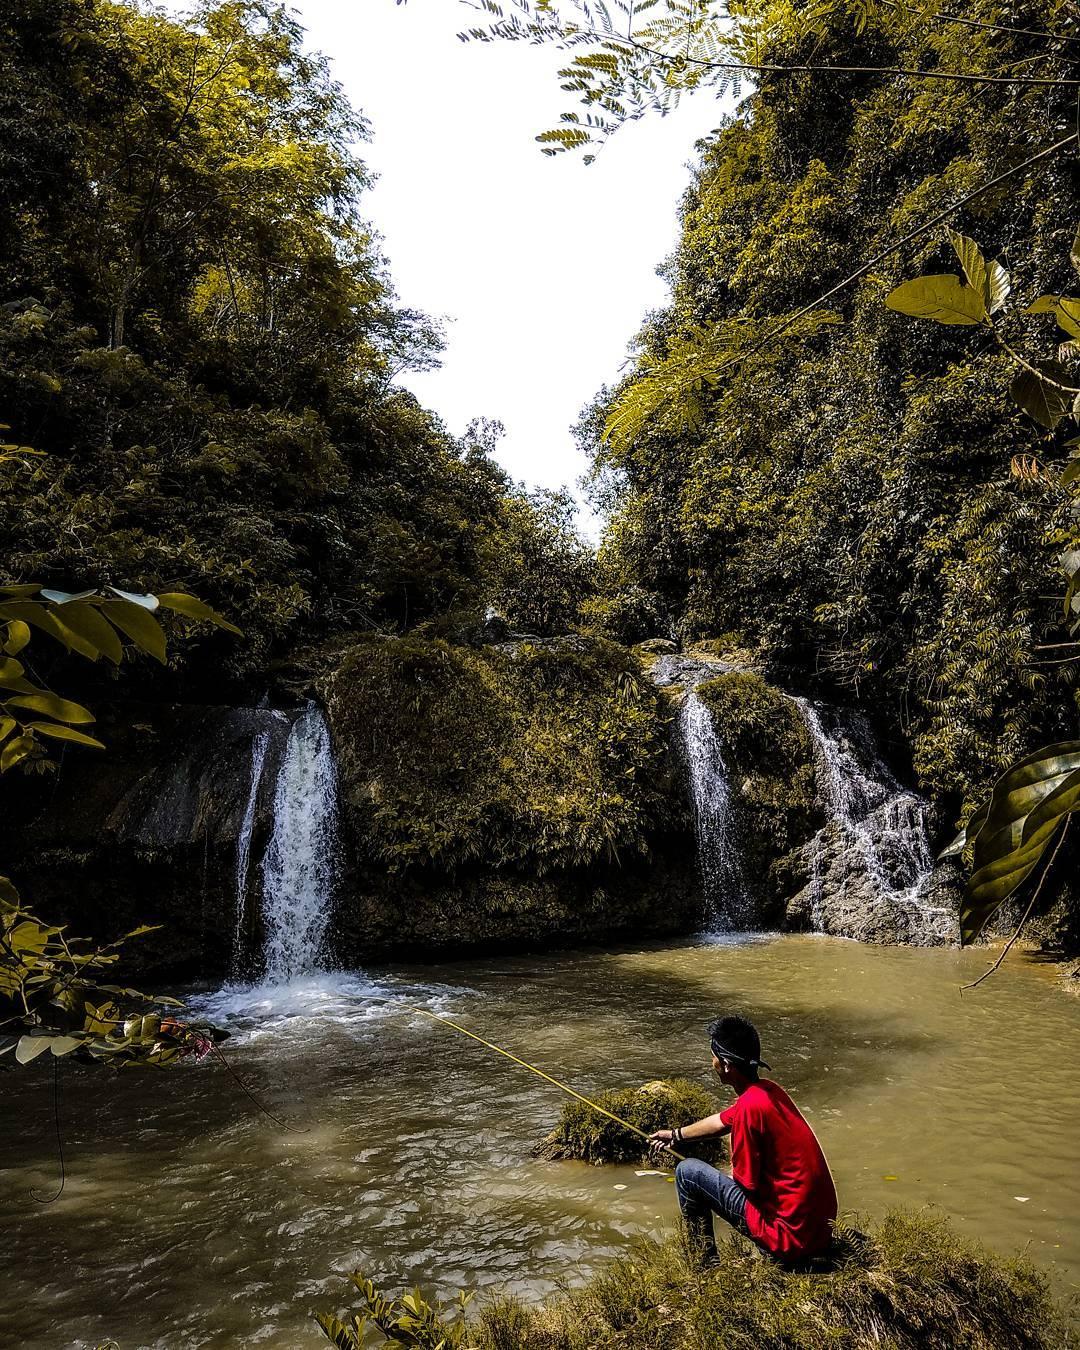 Sungai Sumber Kehidupan, Malang, Kabupaten Malang, Dolan Dolen, Dolaners Sungai Sumber Kehidupan by att - Dolan Dolen